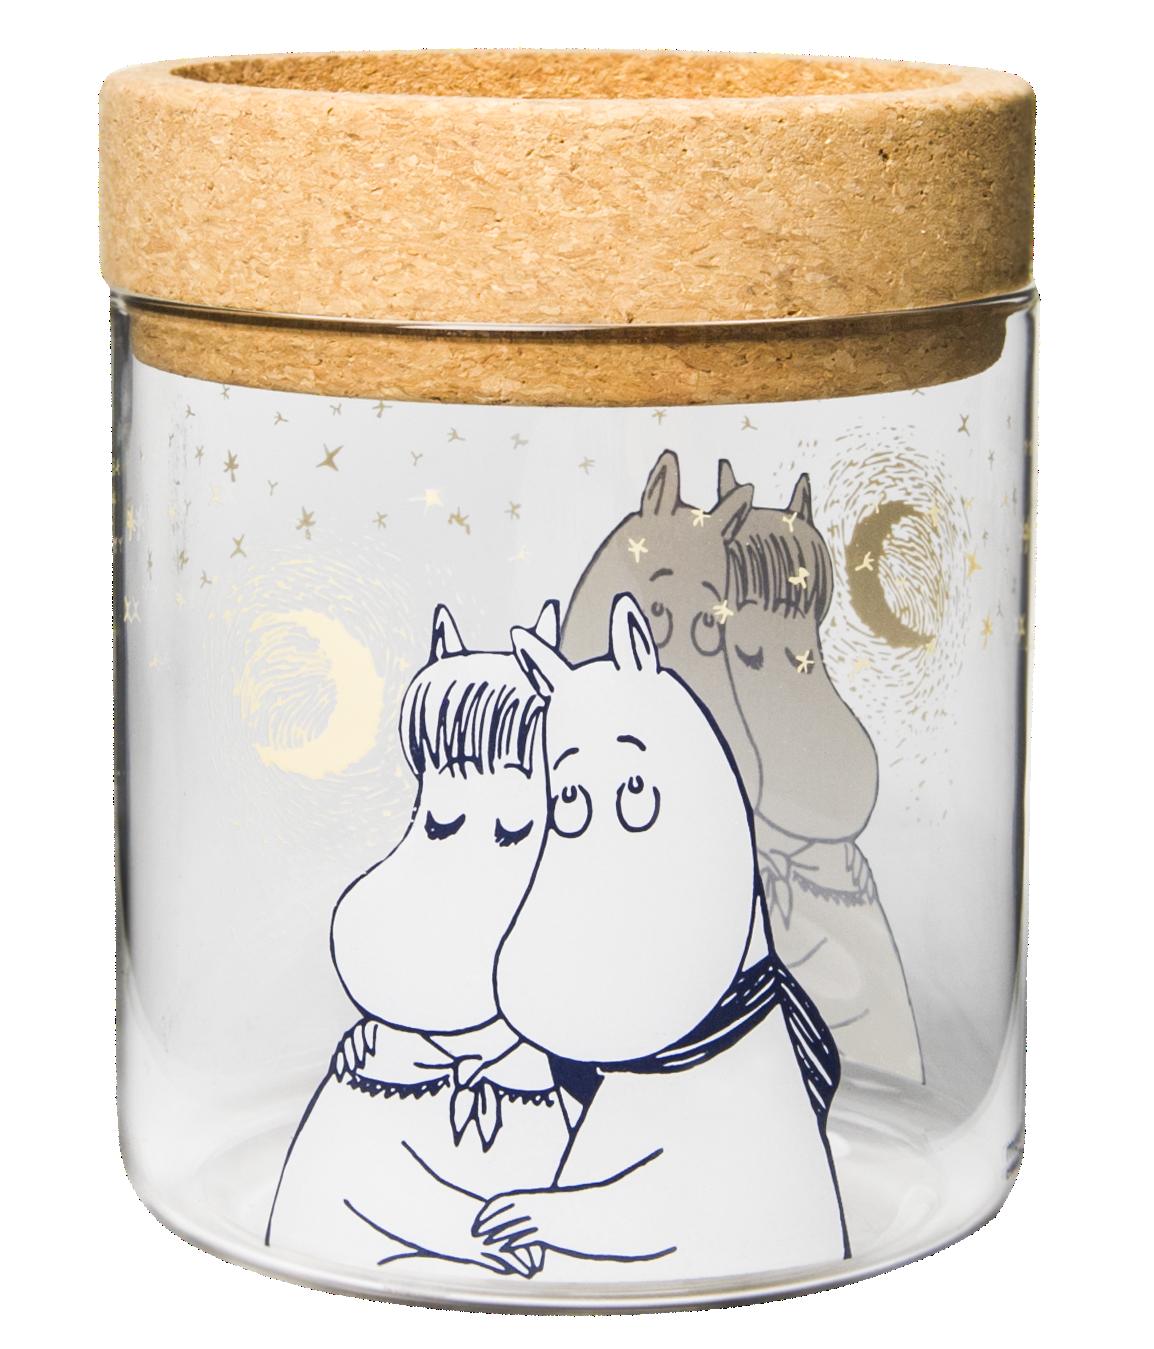 Muurla lantern/jar with cork stand/lid, Moomin Winter romance